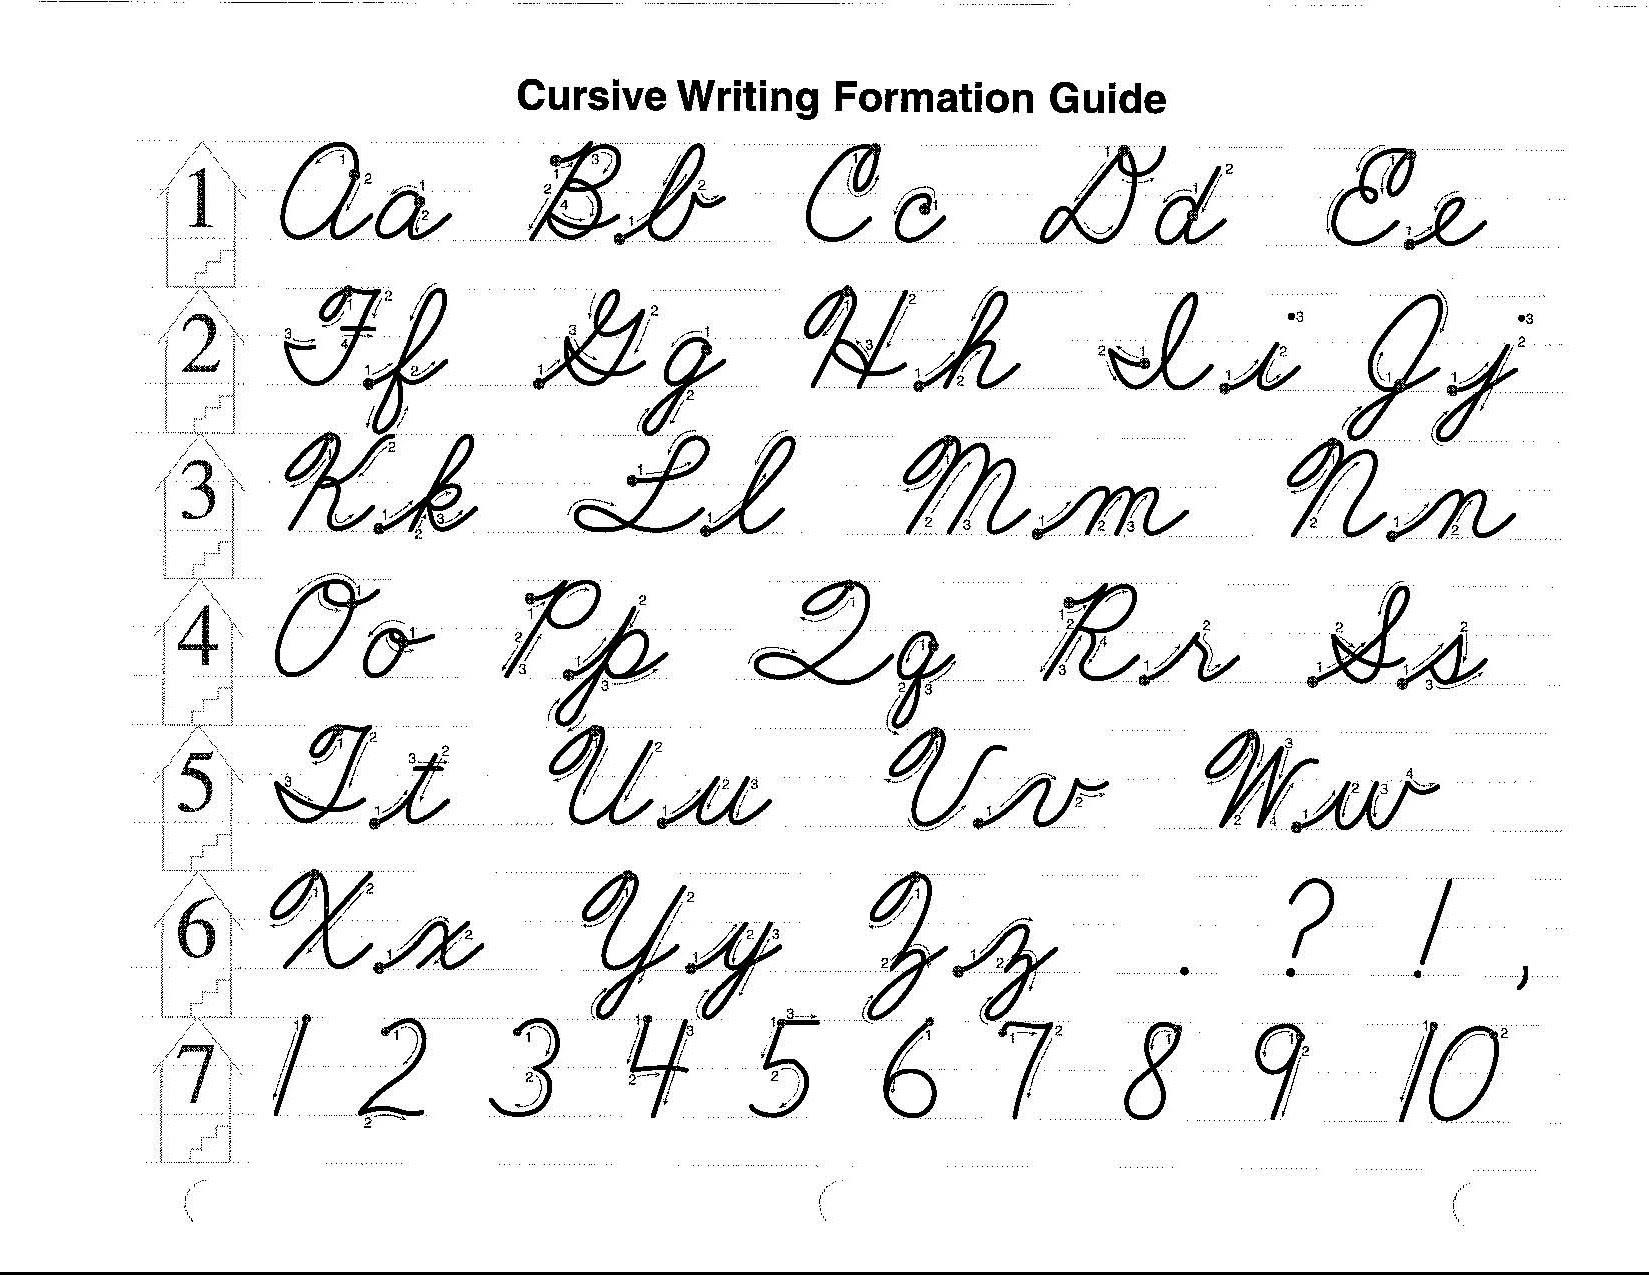 Worksheets : Cursive Writing Alphabet Islamichomeeducation